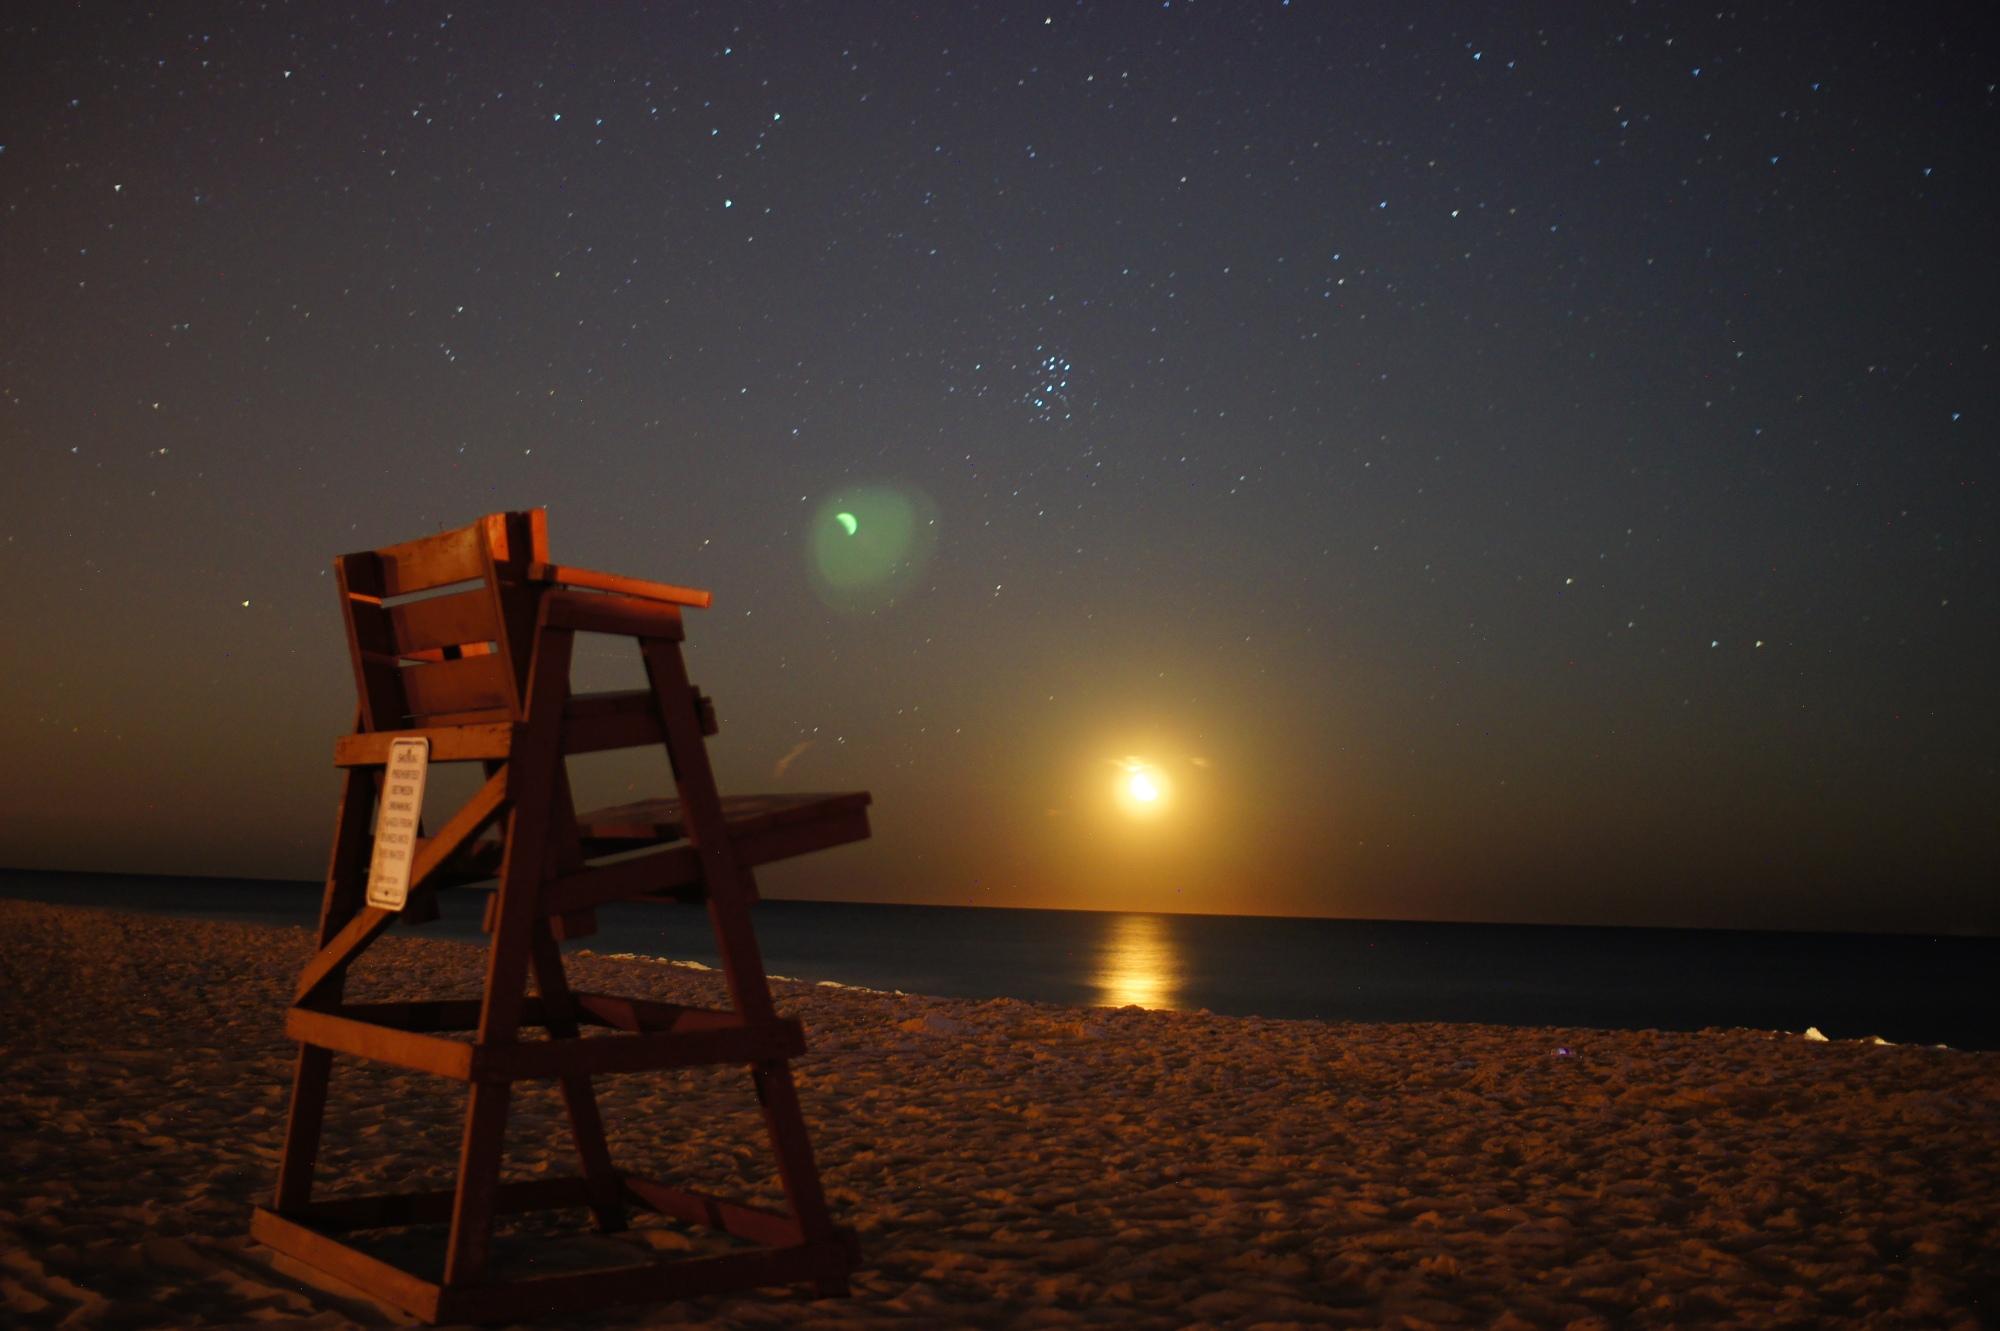 Long beach island lifeguard chair